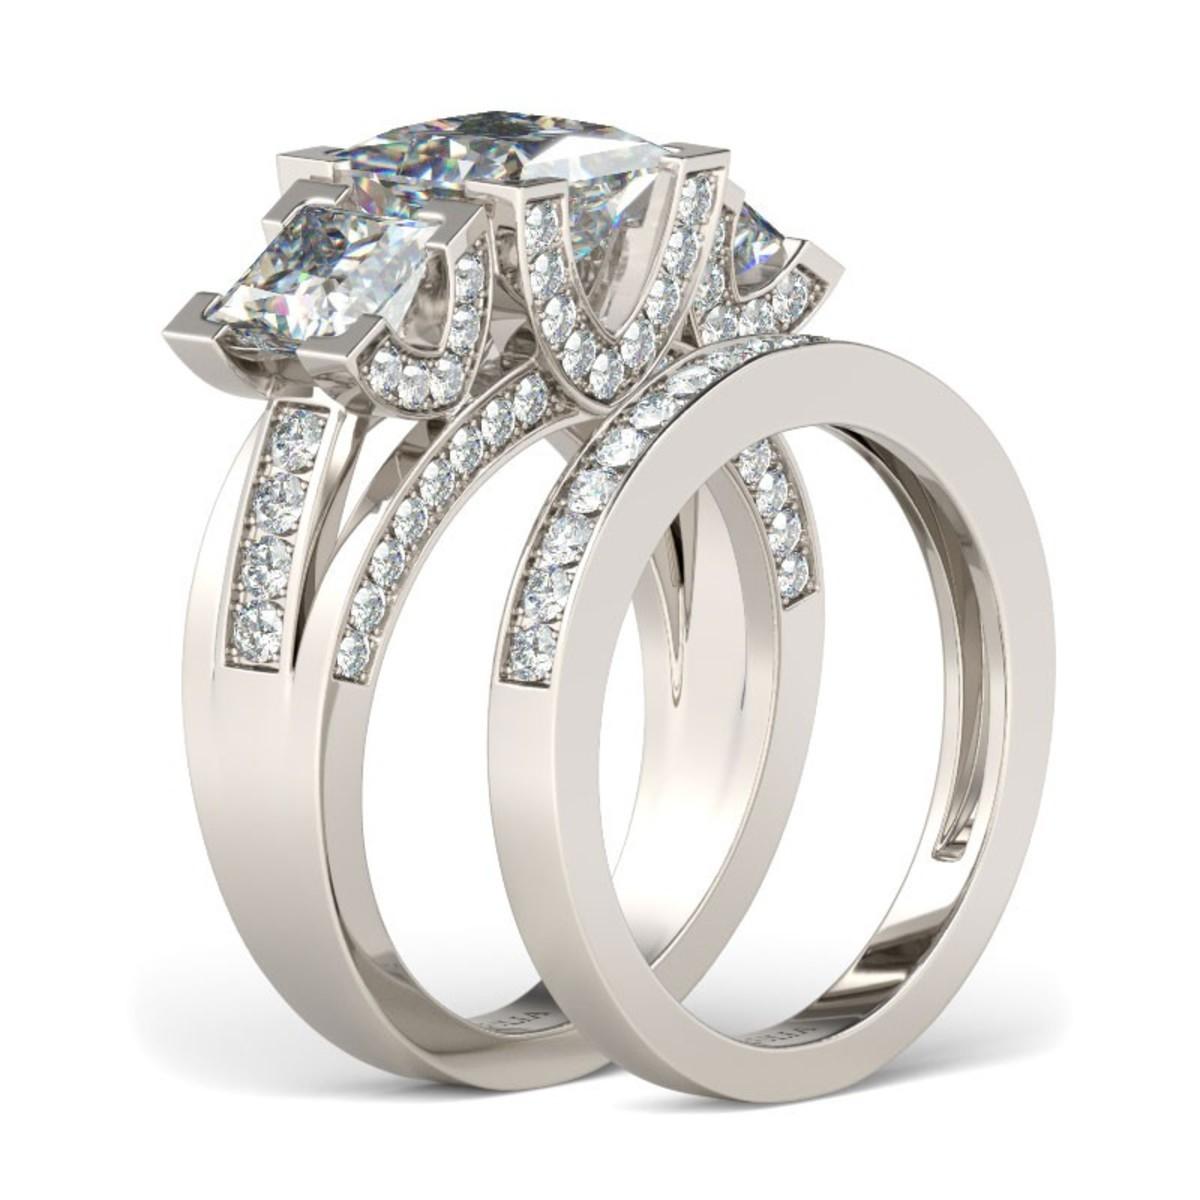 Rhodium Plated 925 Sterling Silver Women's Wedding Ring